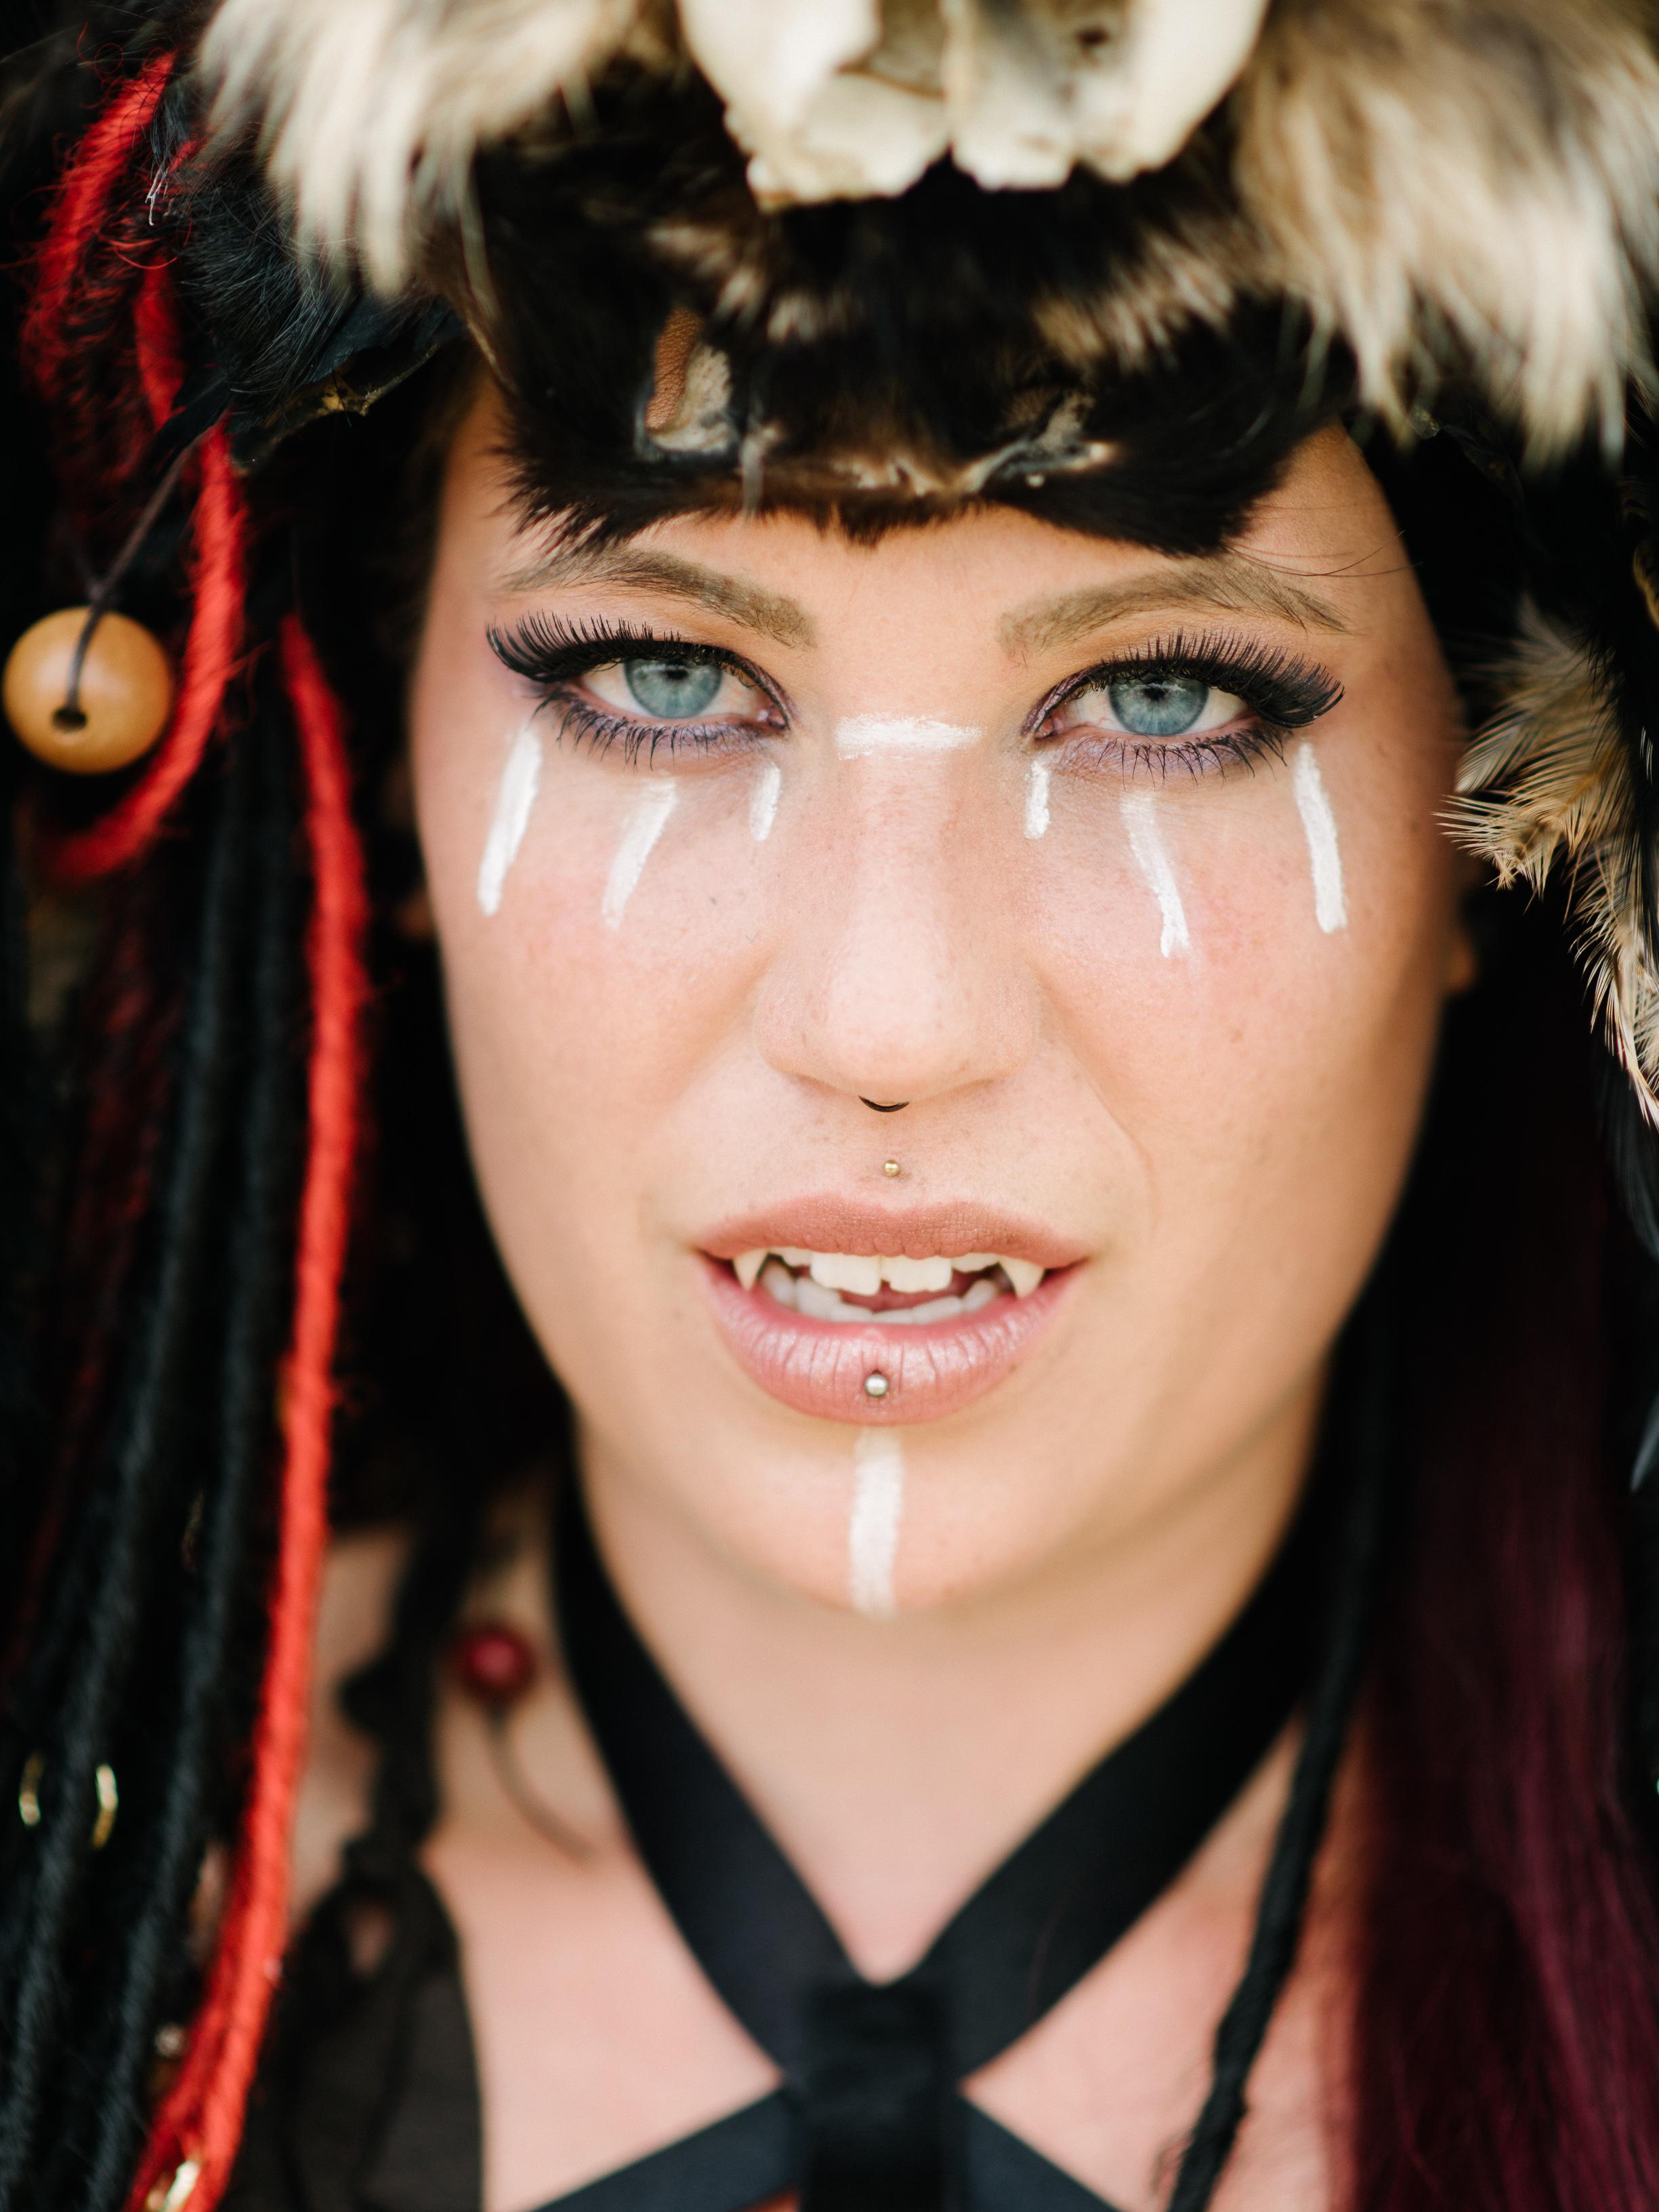 ML_16_Faces of Mera Luna_Robin_Schmiedebach_113910.jpg